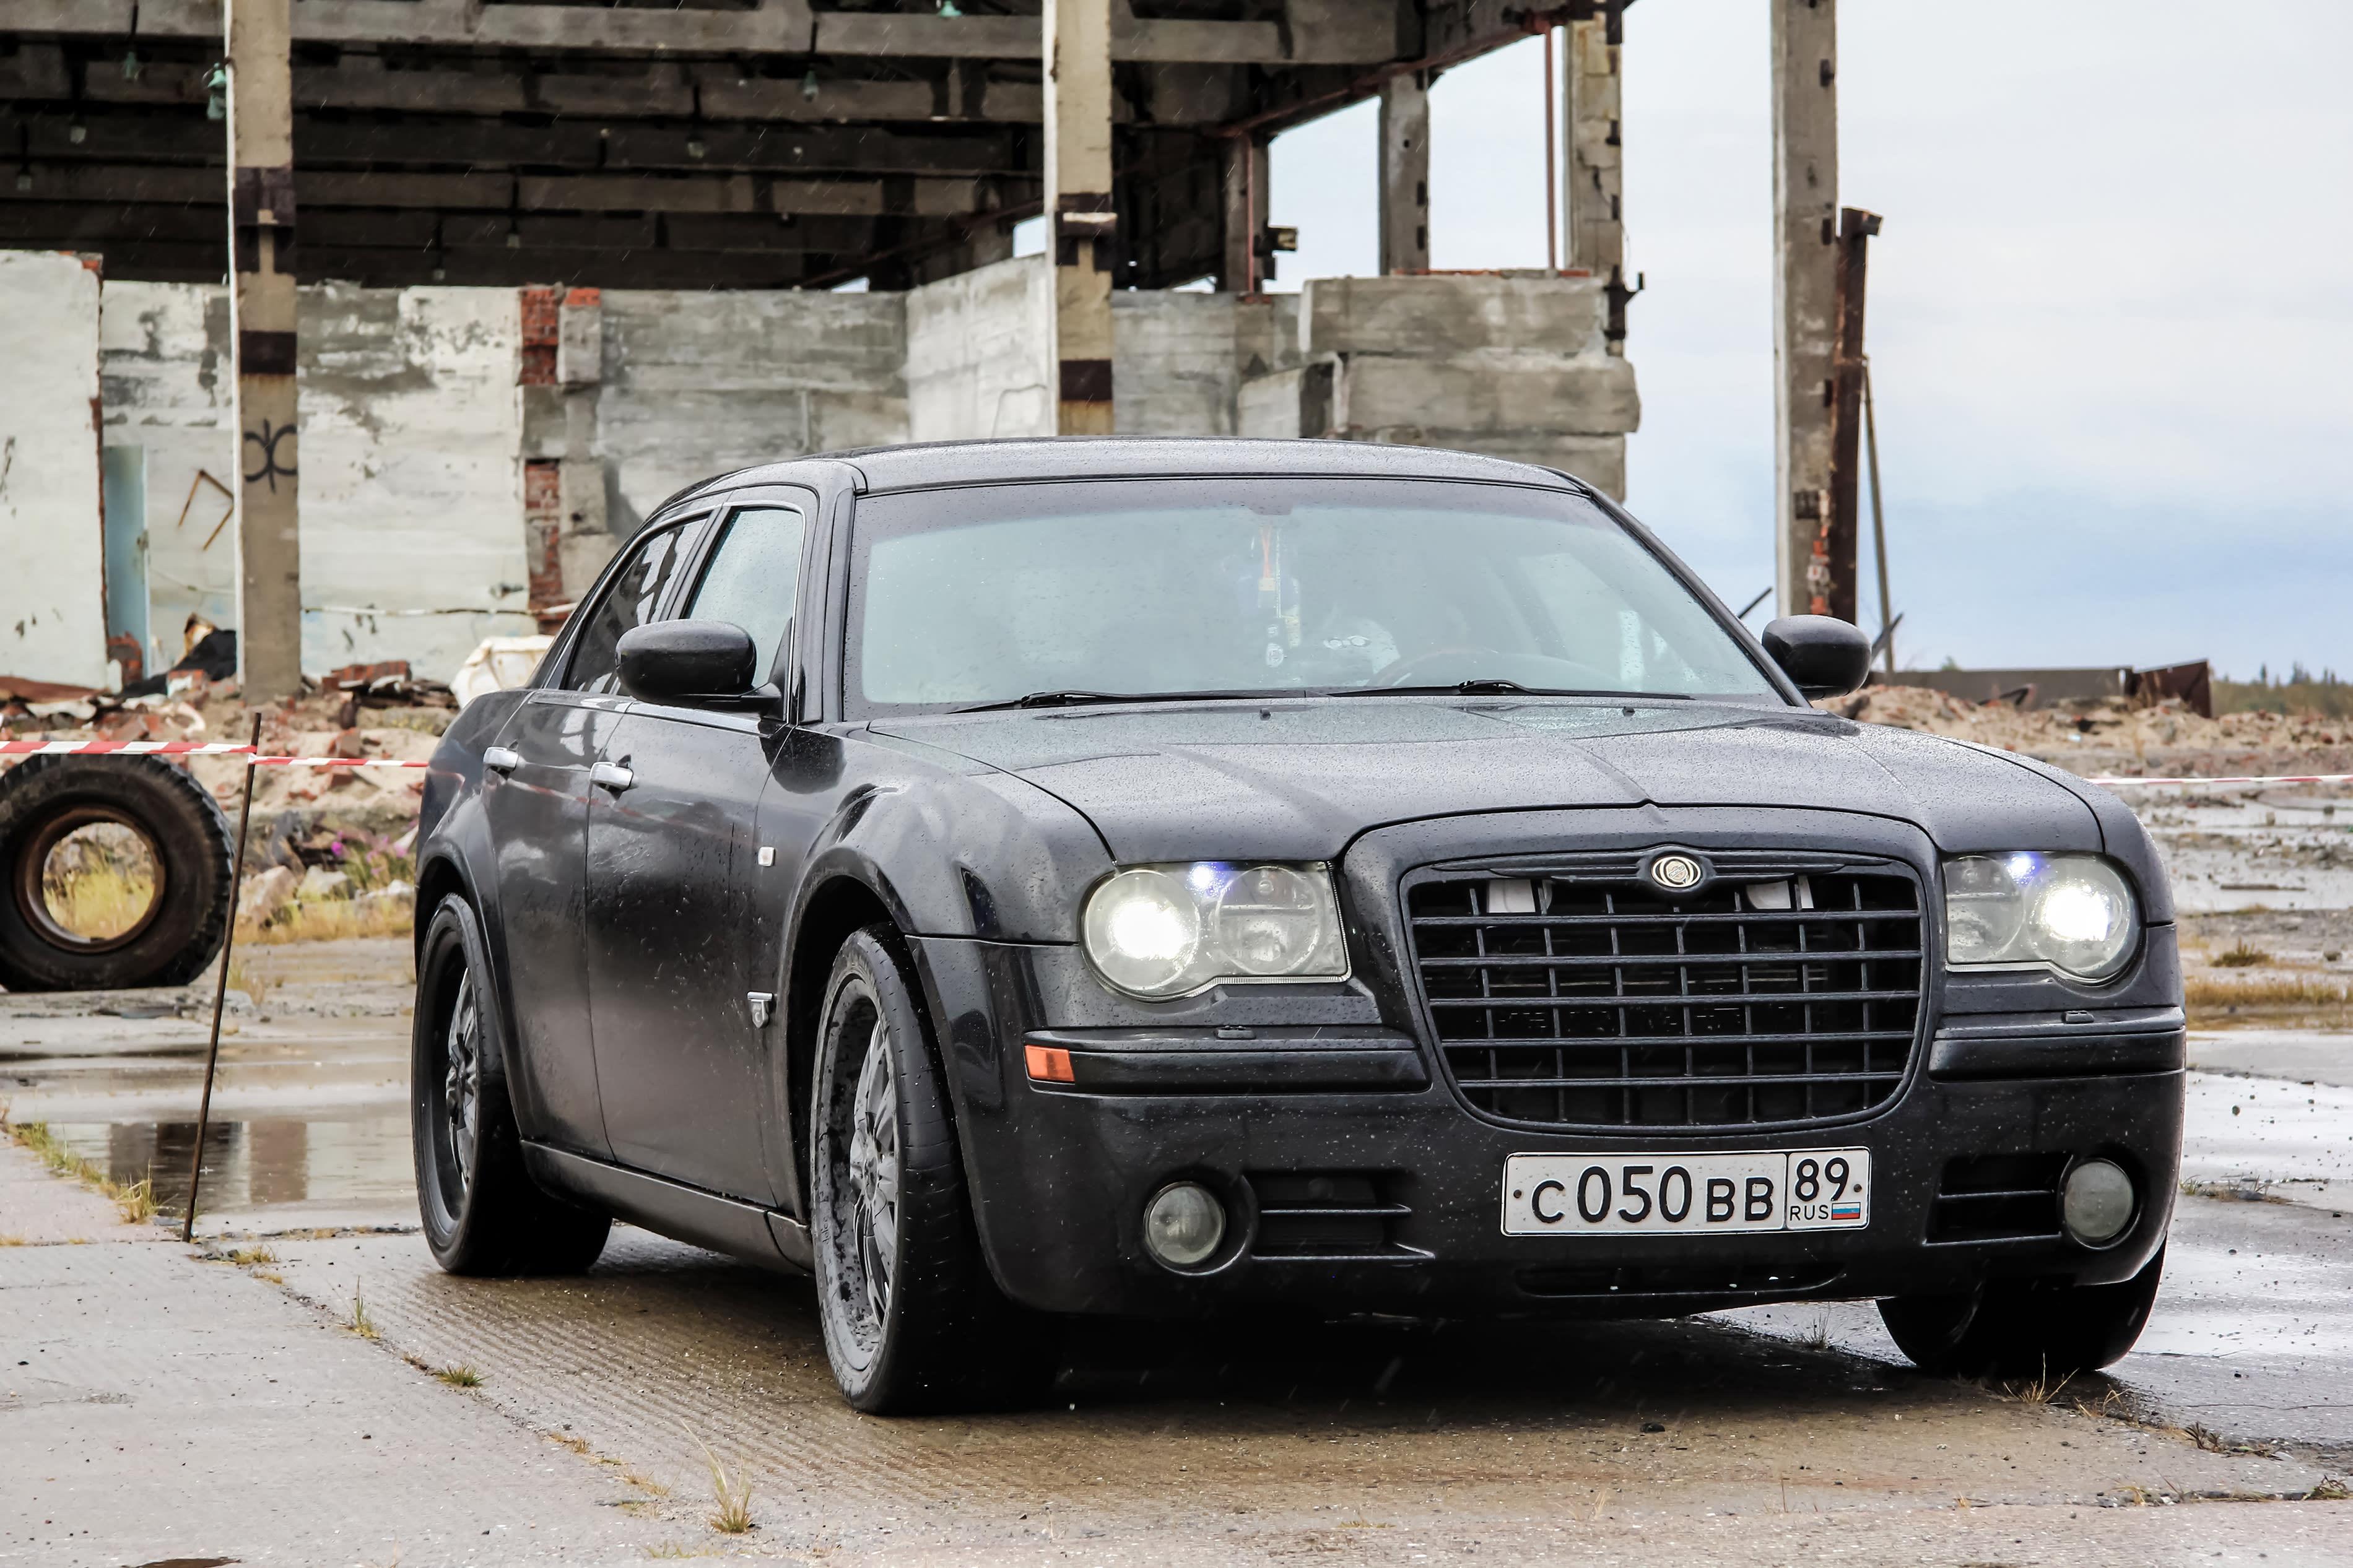 Fiat Chrysler Recalls 1.4 Million Vehicles Due to Takata Air Bags